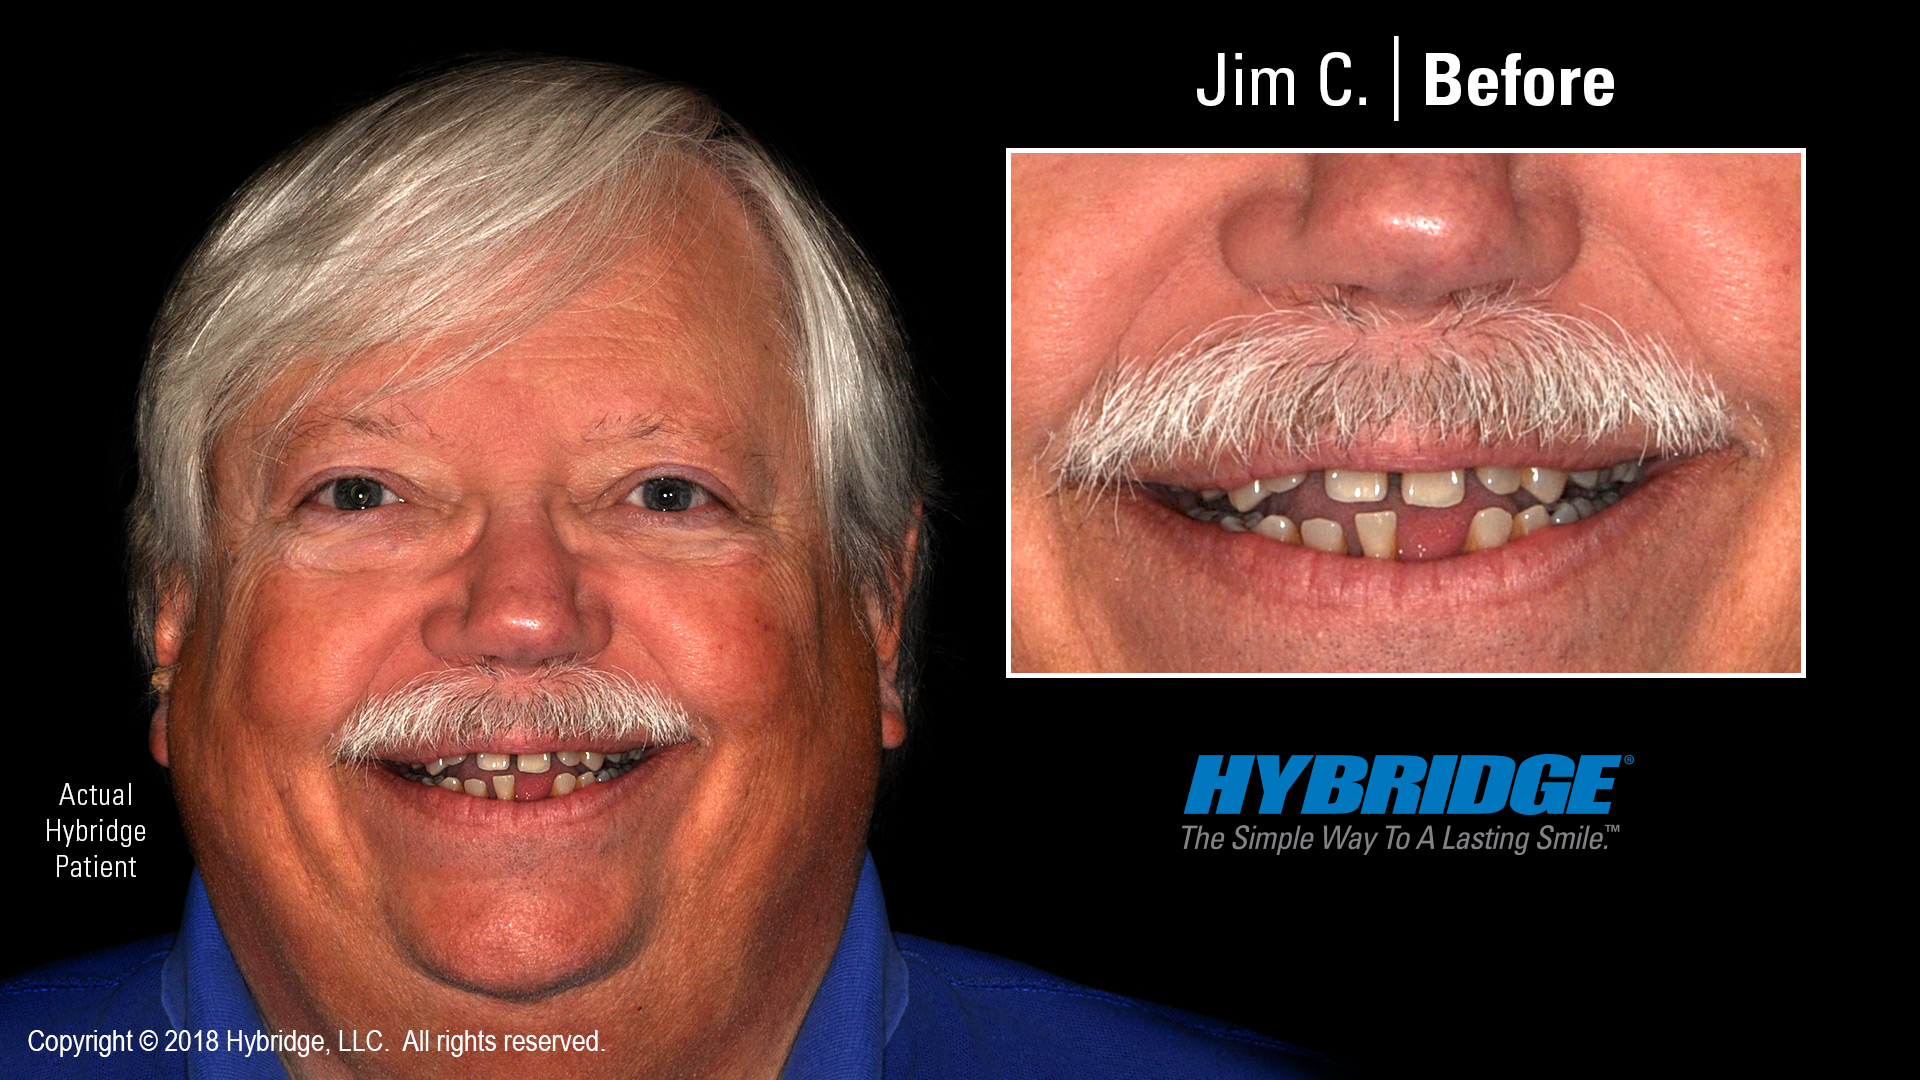 Jim before Hybridge